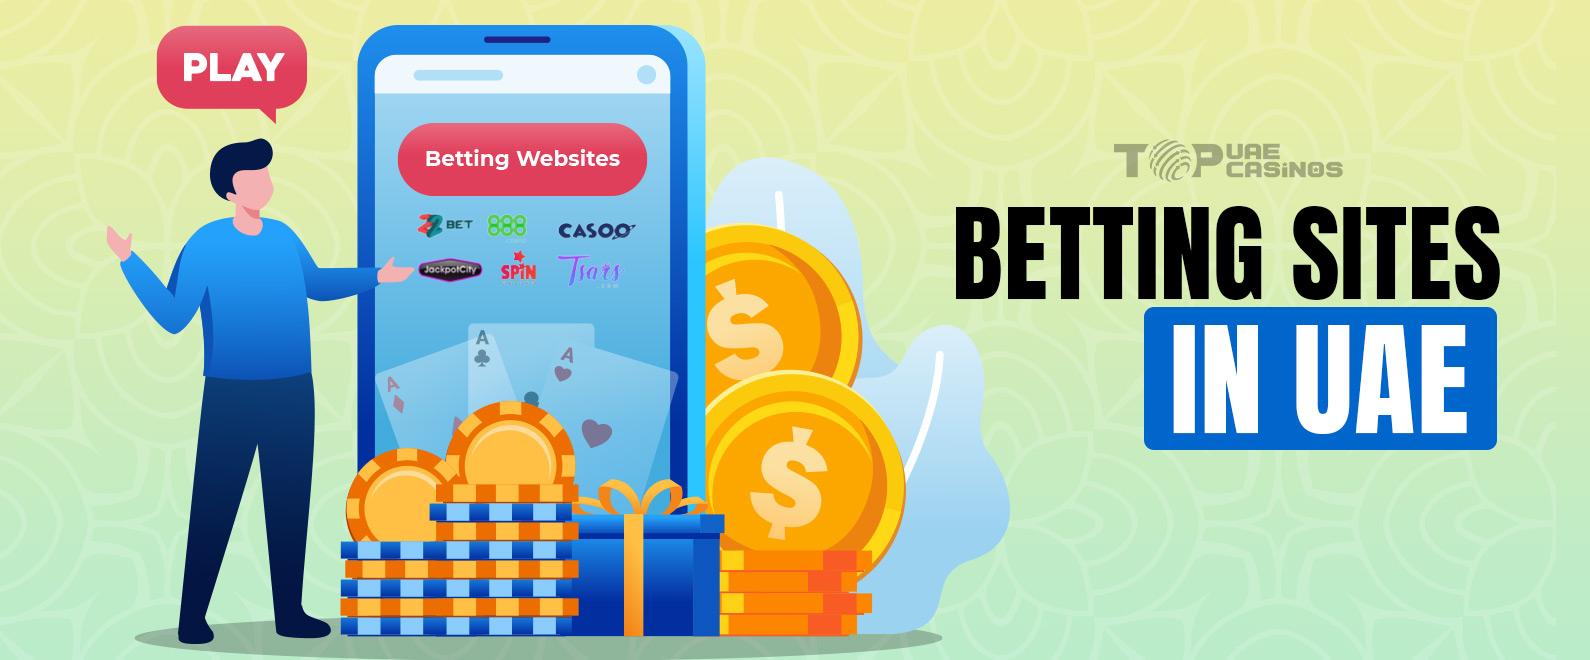 betting sites in uae